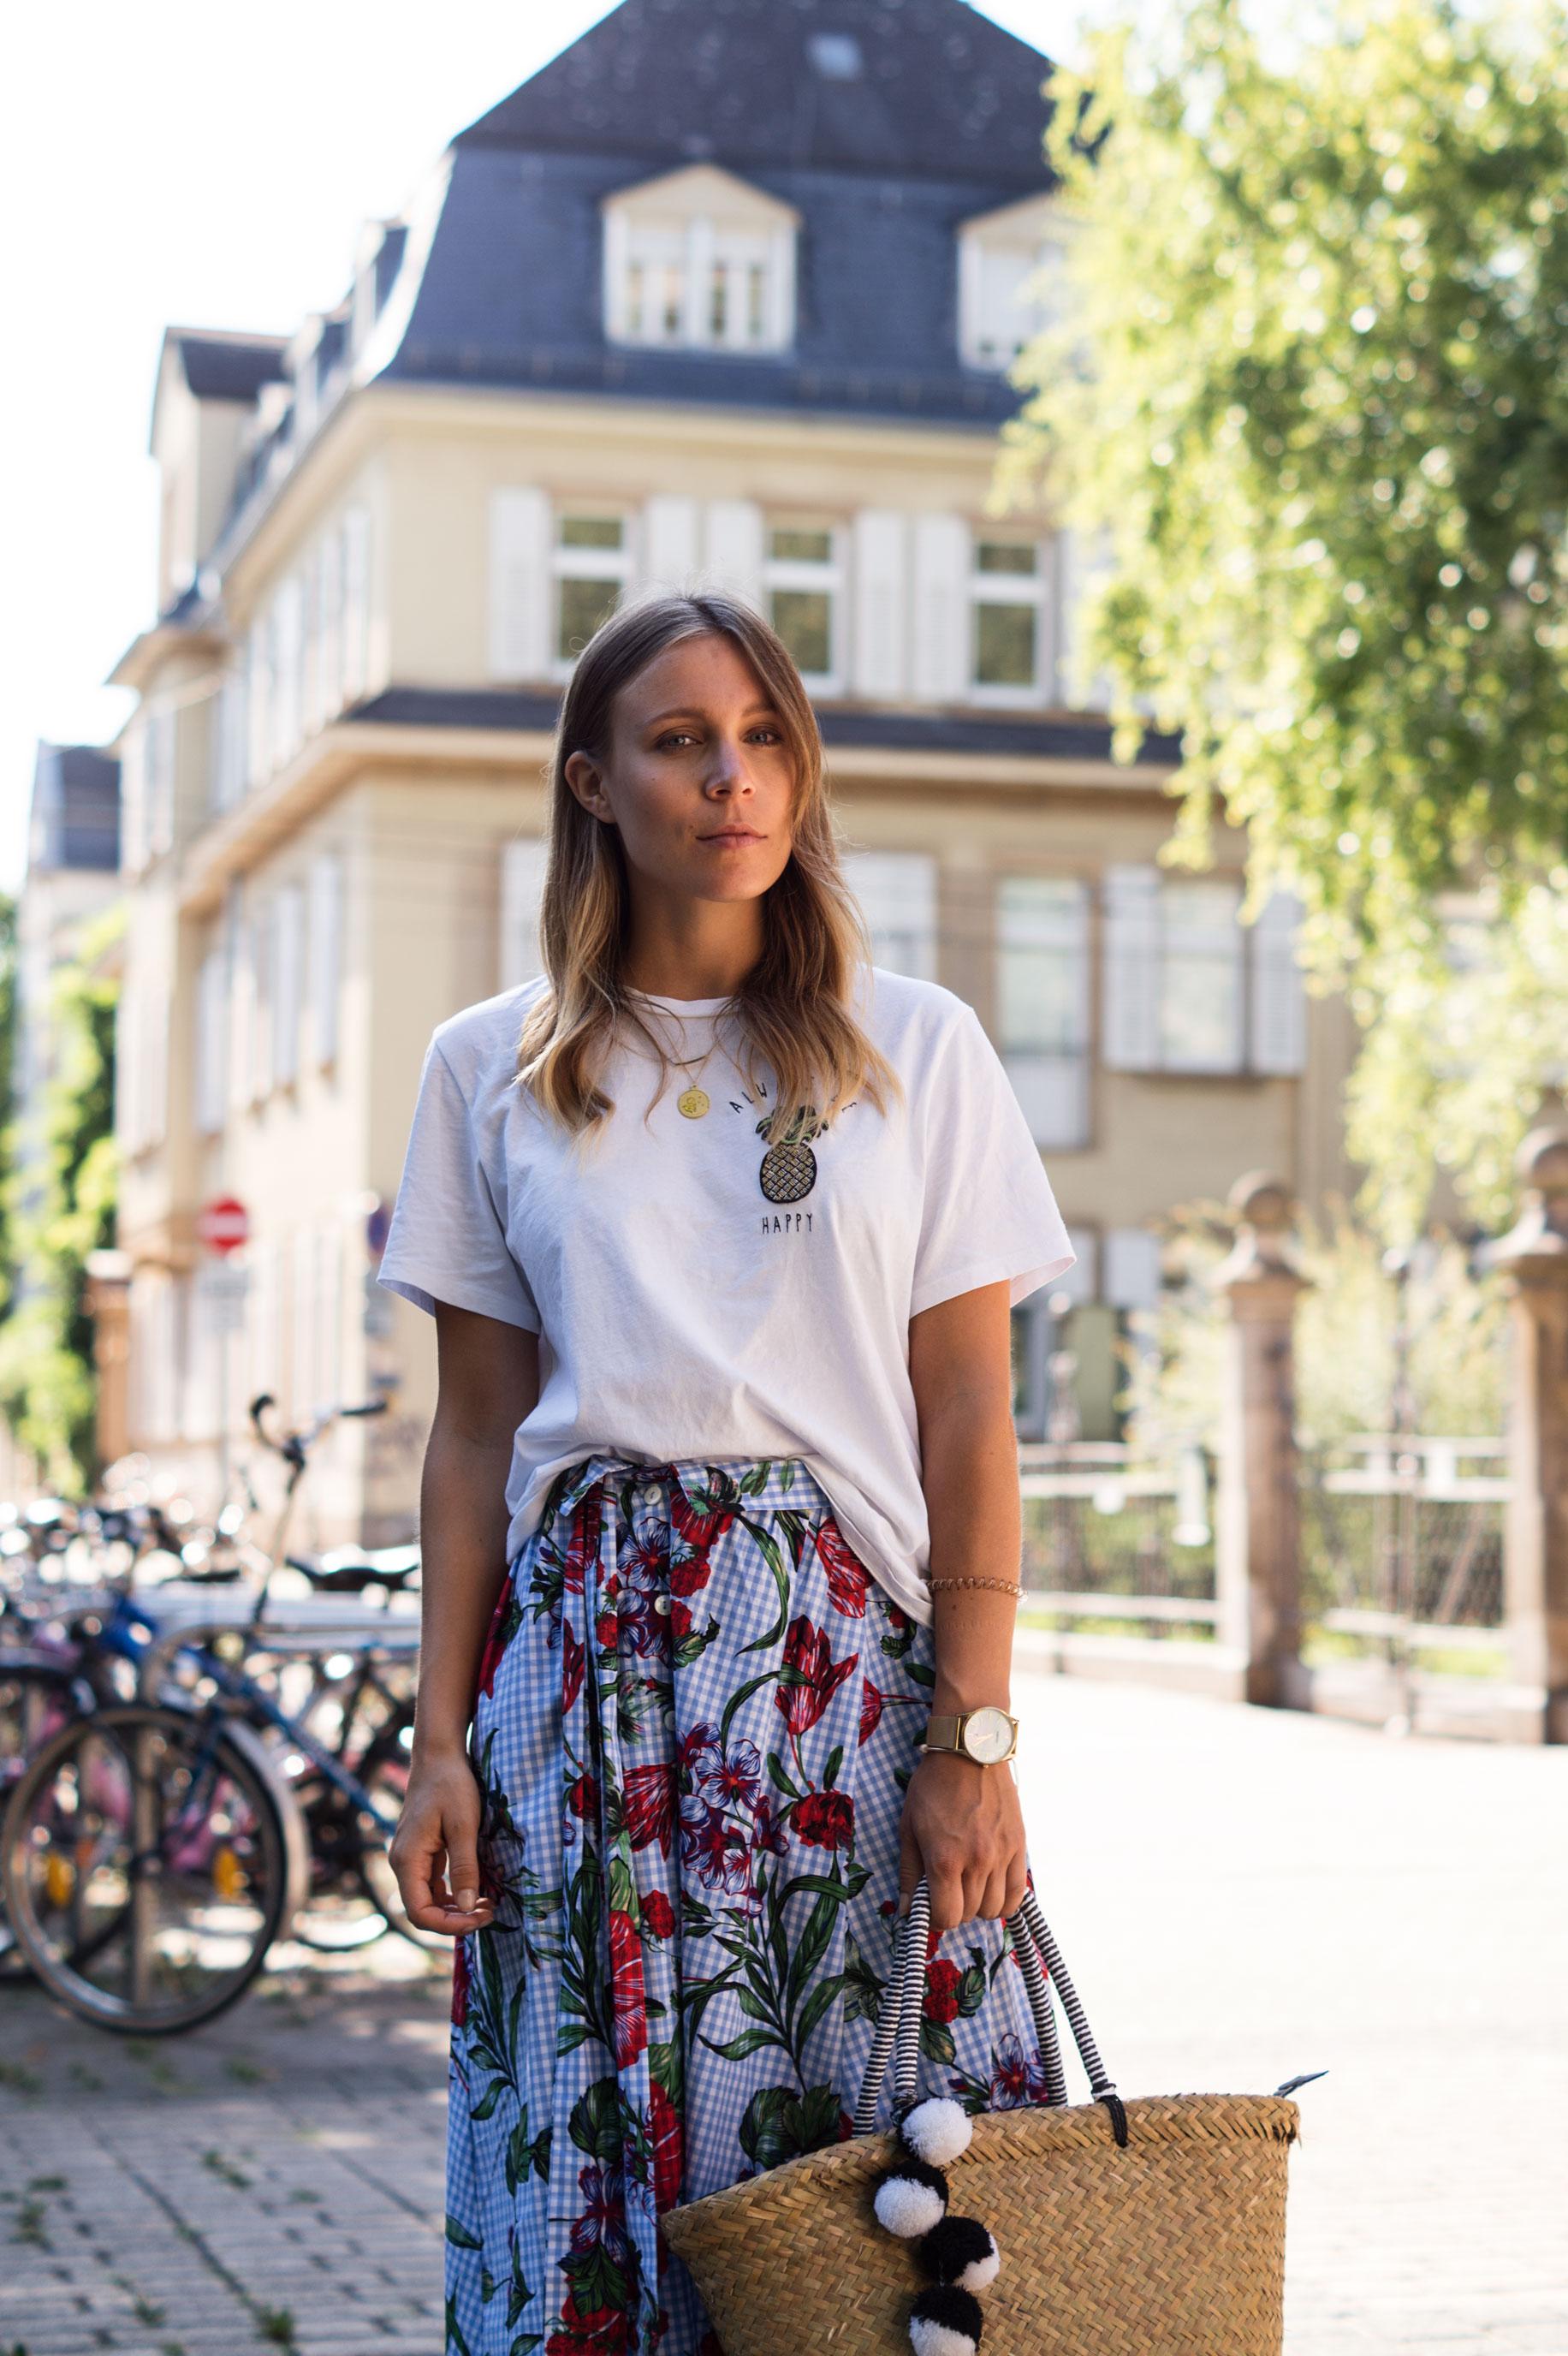 Zara Midi Skirt Ginham Floral Print Blumenmuster karierter Rock Print Shirt Manfield Mules Sariety Summer Shopping Look_12